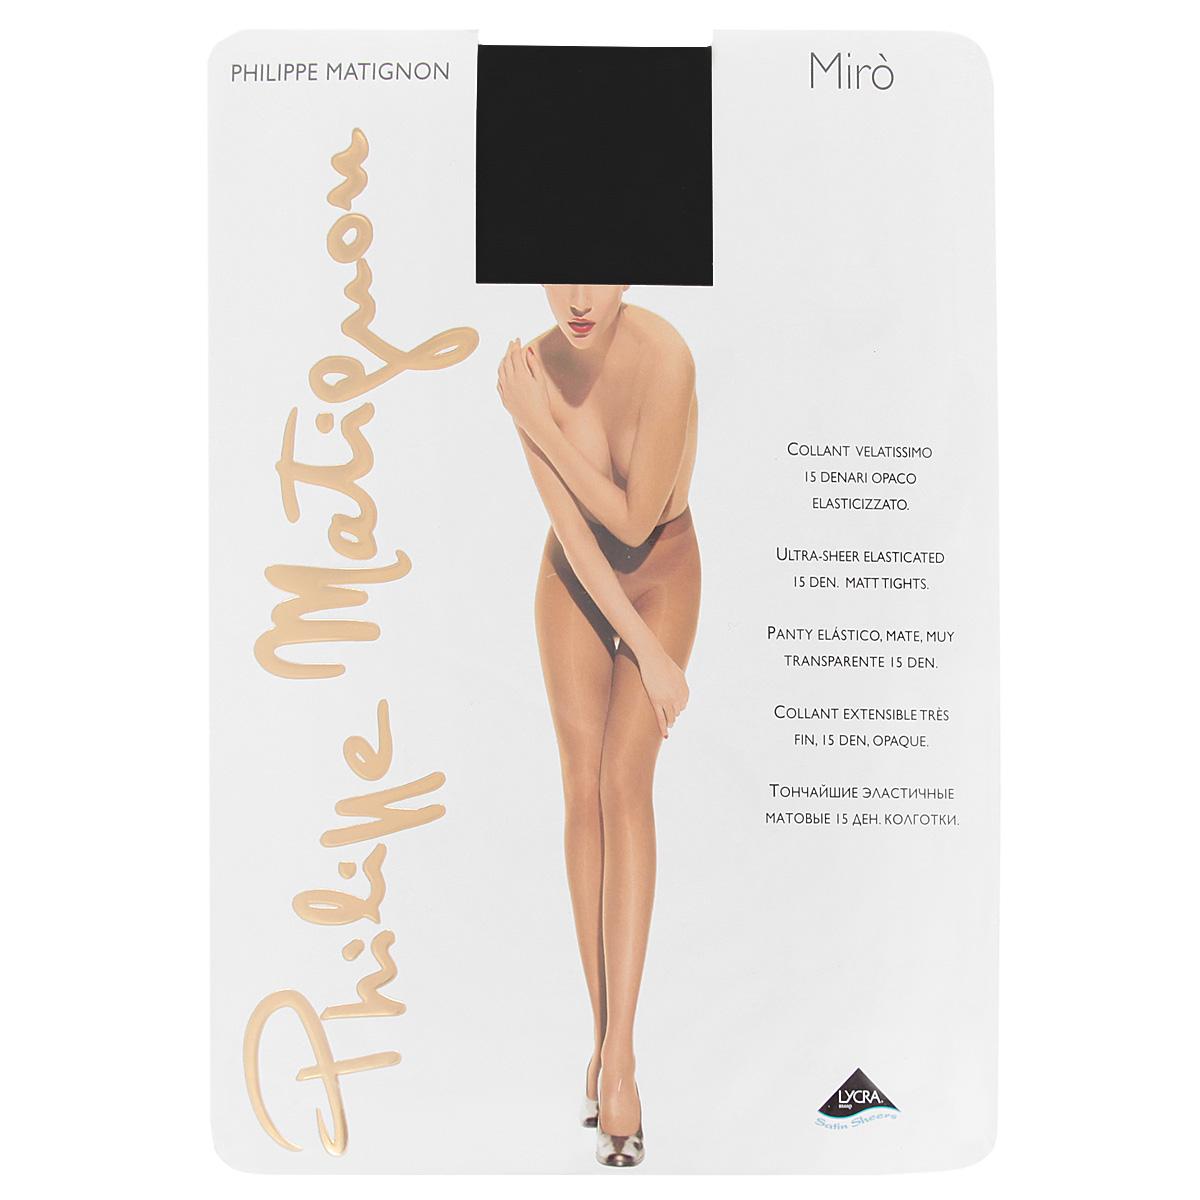 Колготки классические Philippe Matignon Miro 15. Nero (черные). Размер 4XL philippe matignon колготки miro 15 cappuccio